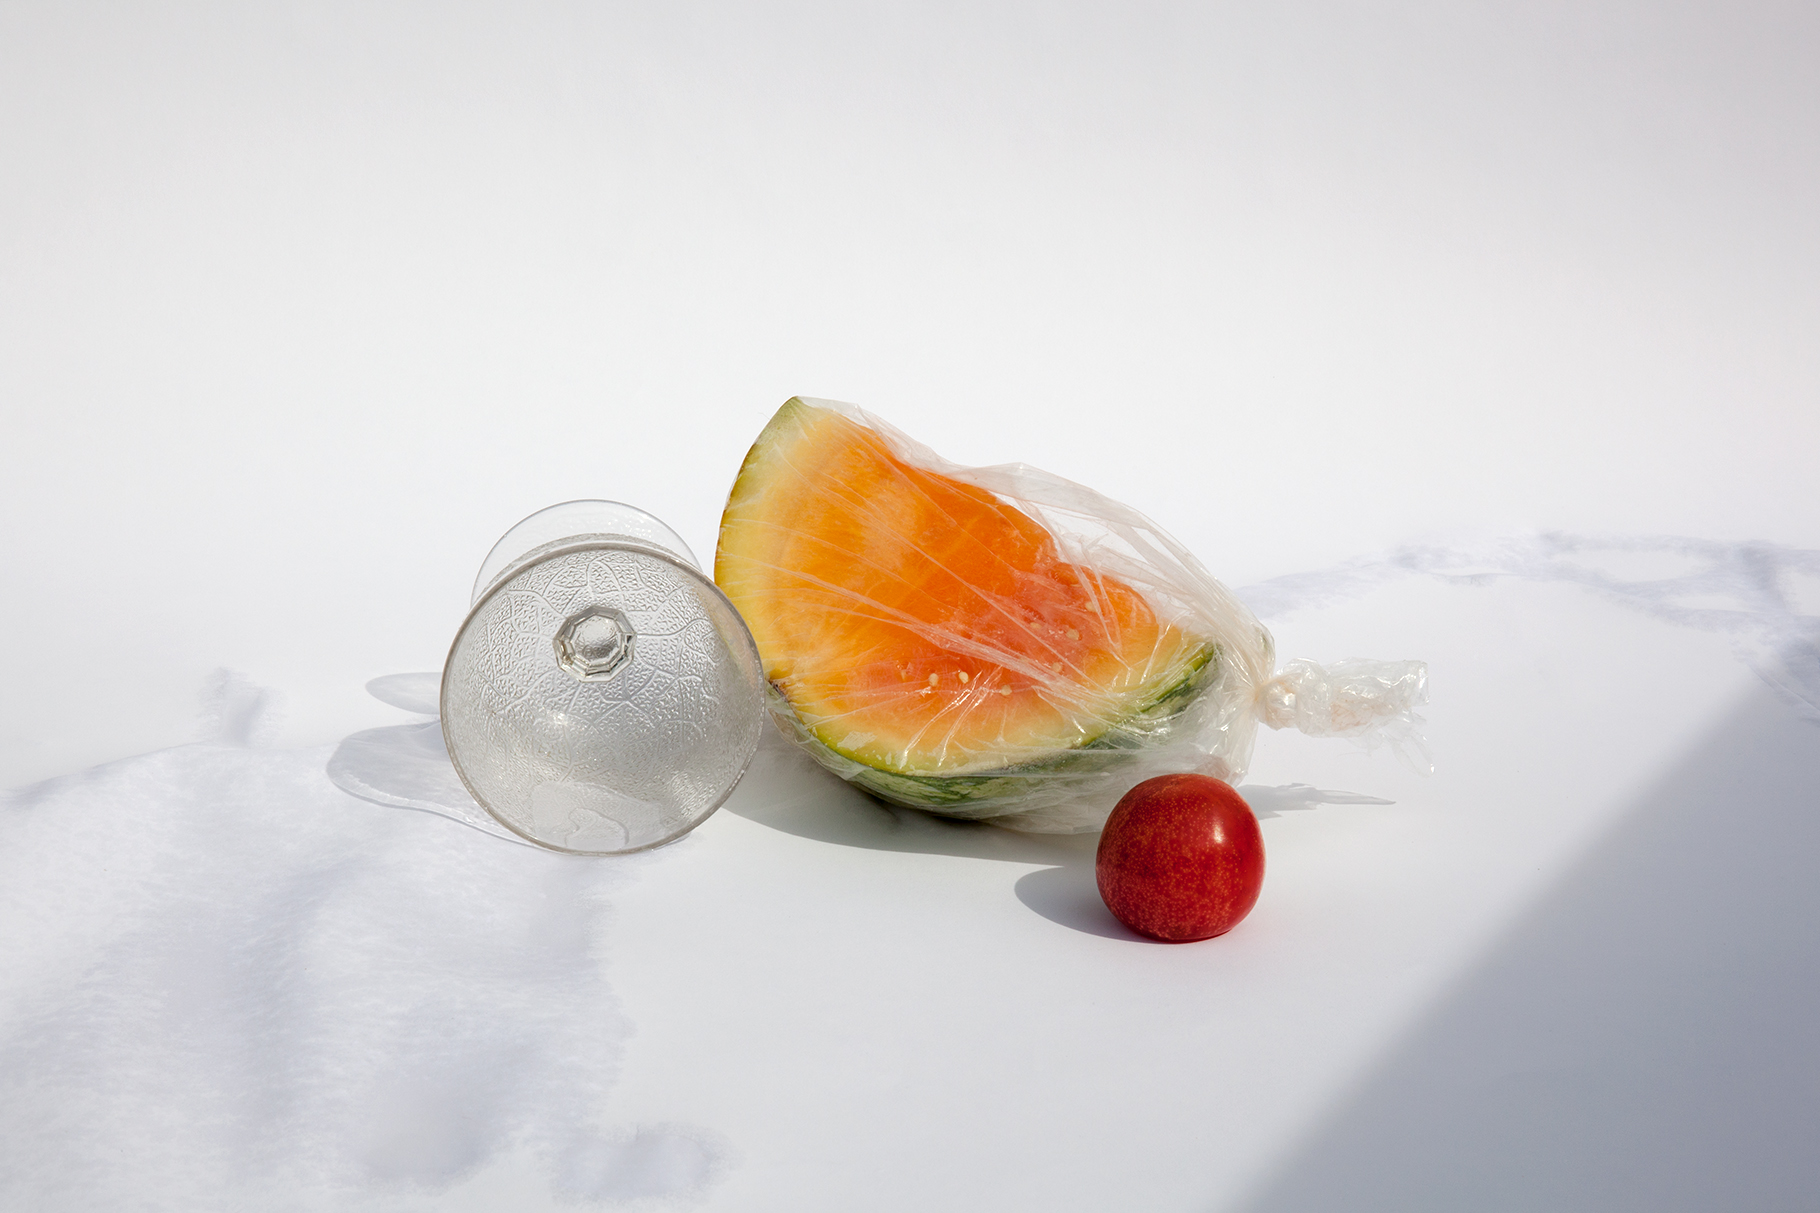 170828_Watermelon_Test.jpg